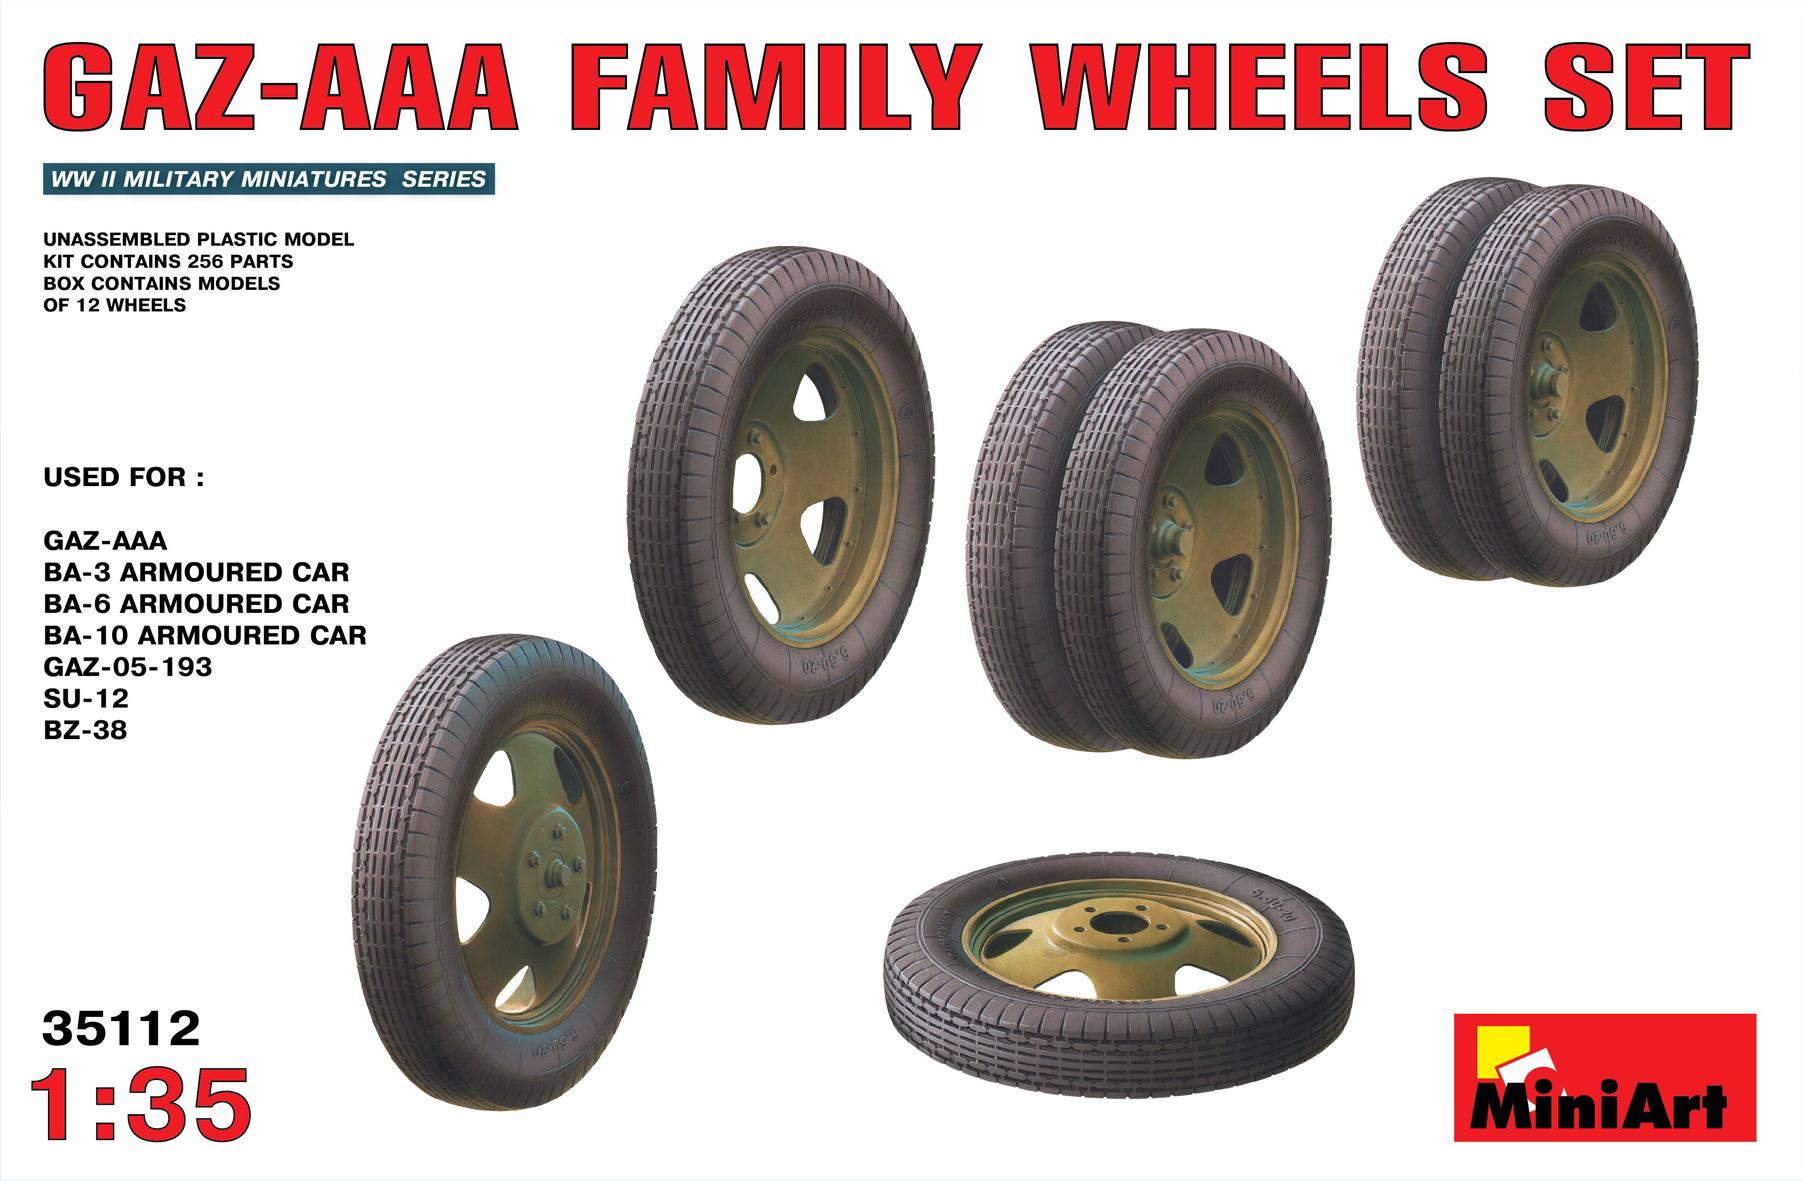 35112 GAZ-AAA FAMILY WHEELS SET